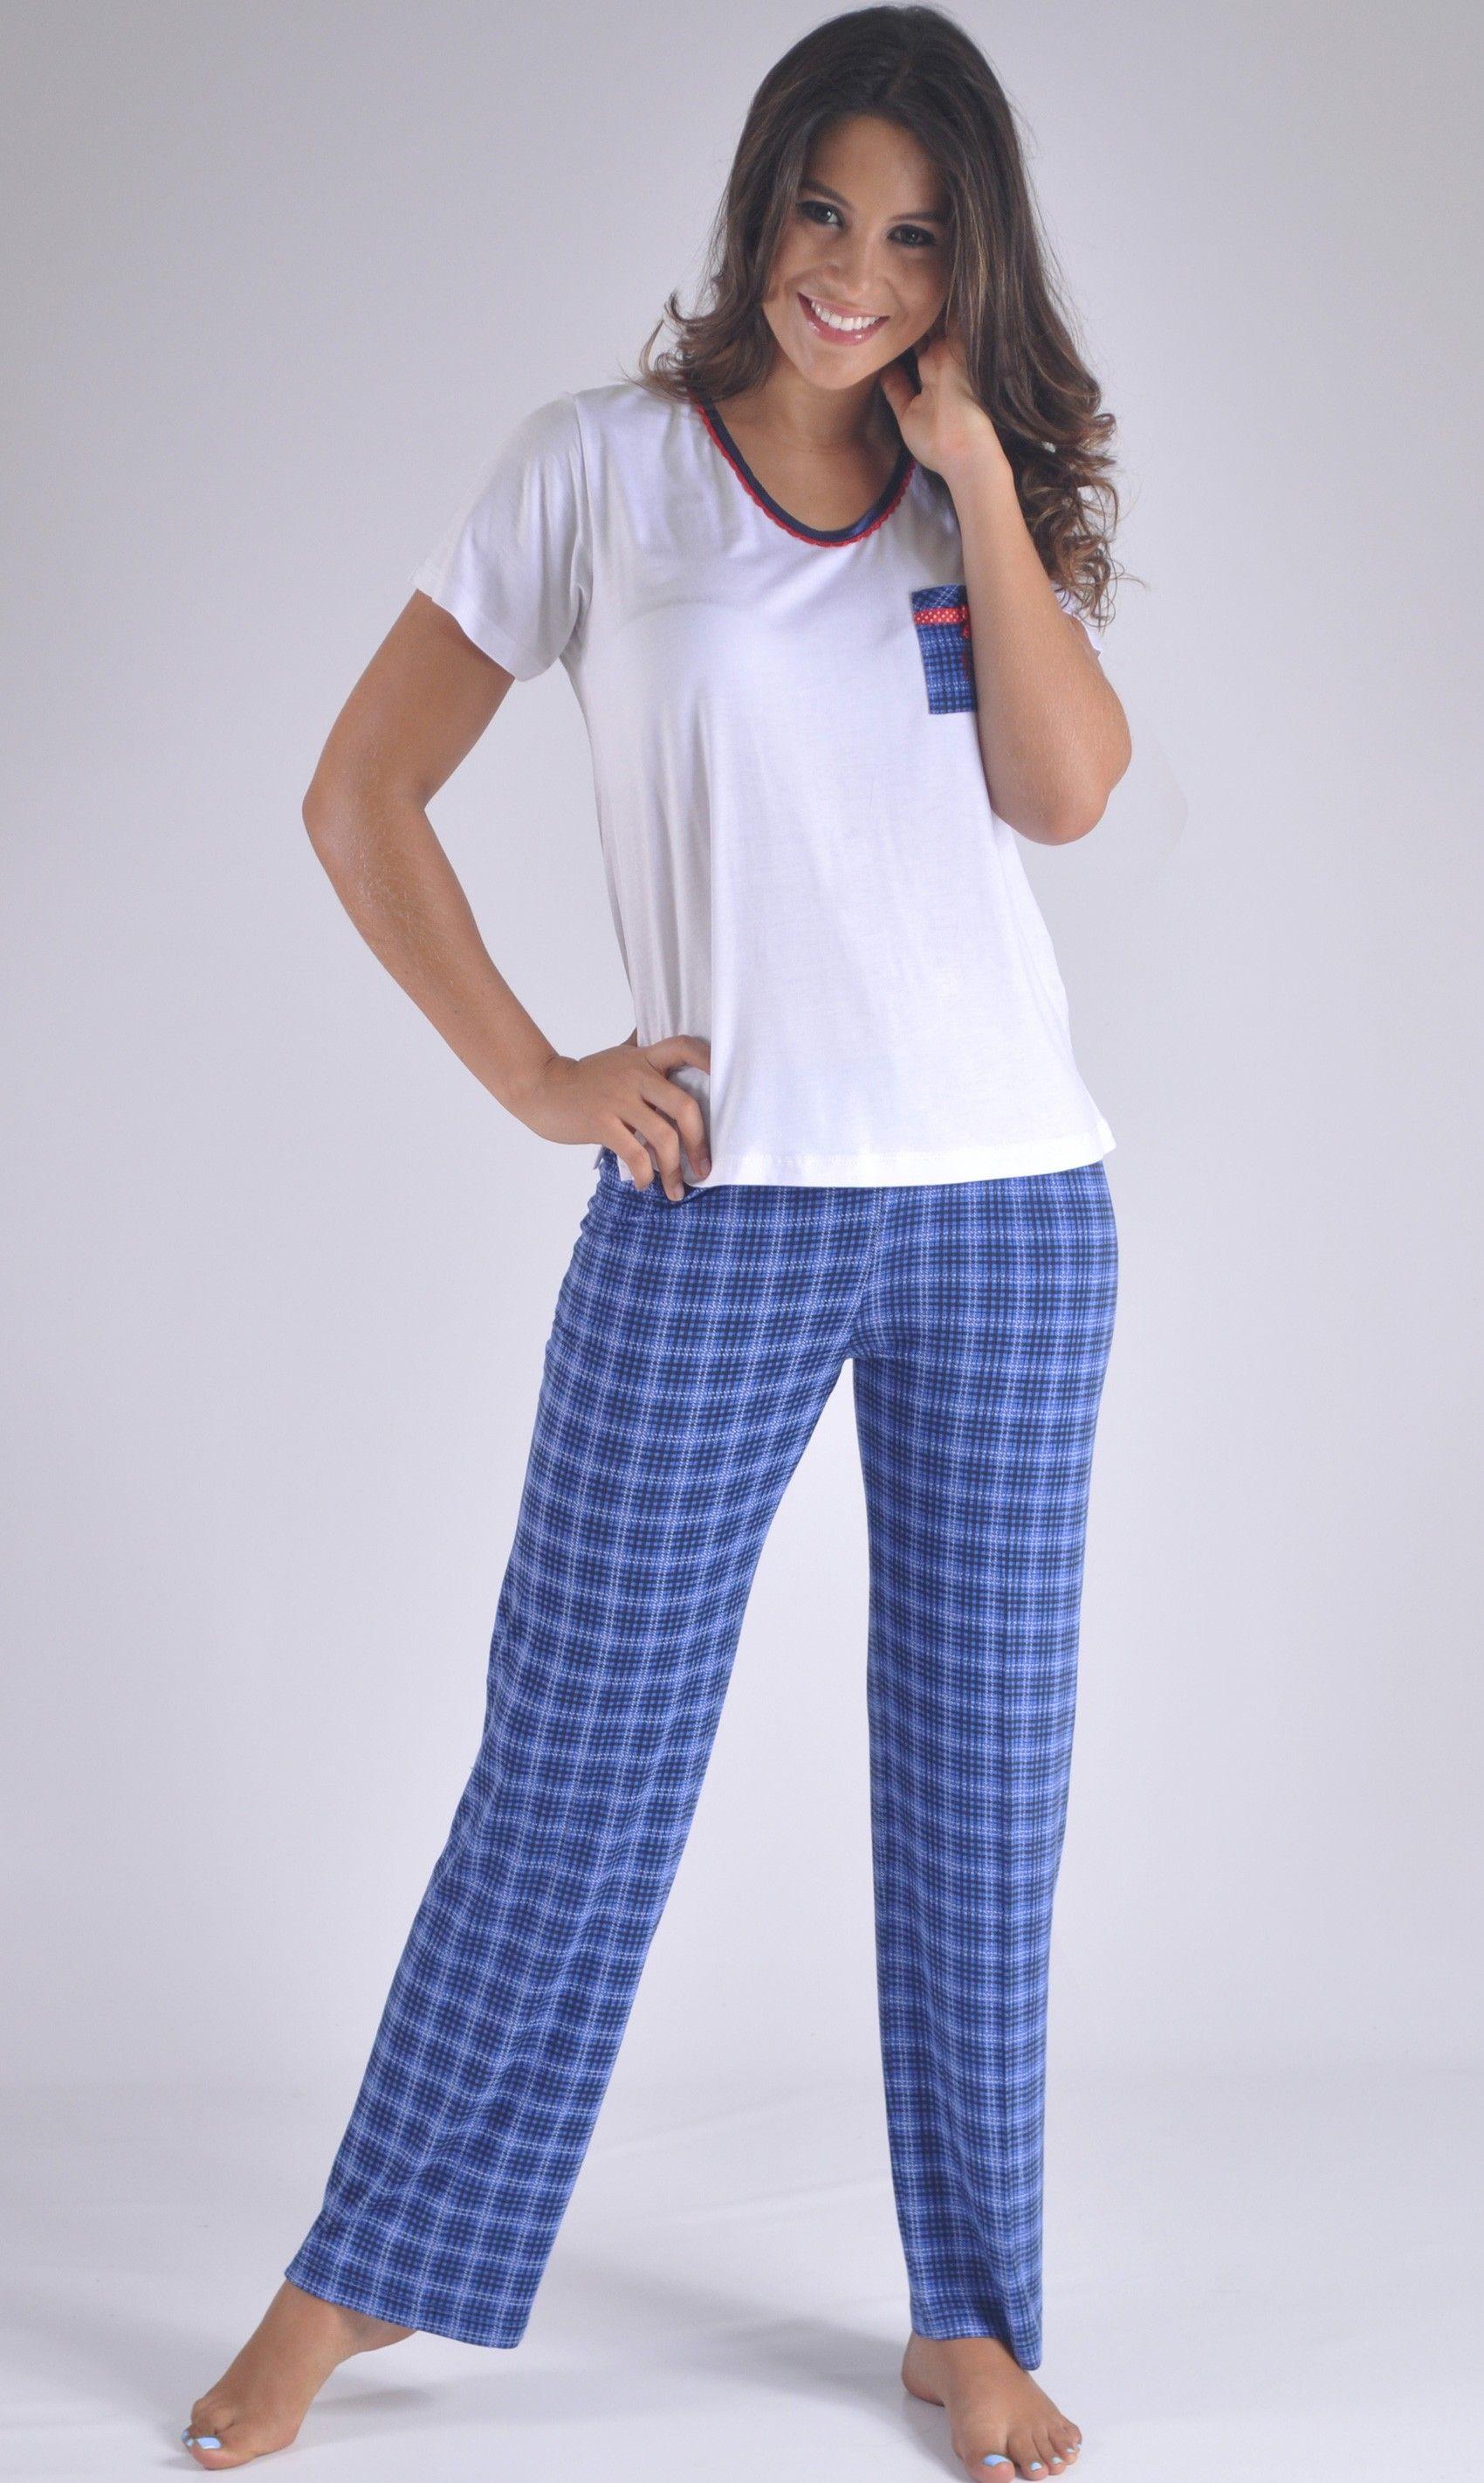 a4a785c69 Pijama fresca en pantalon largo y manga corta, juvenil. Especial ...